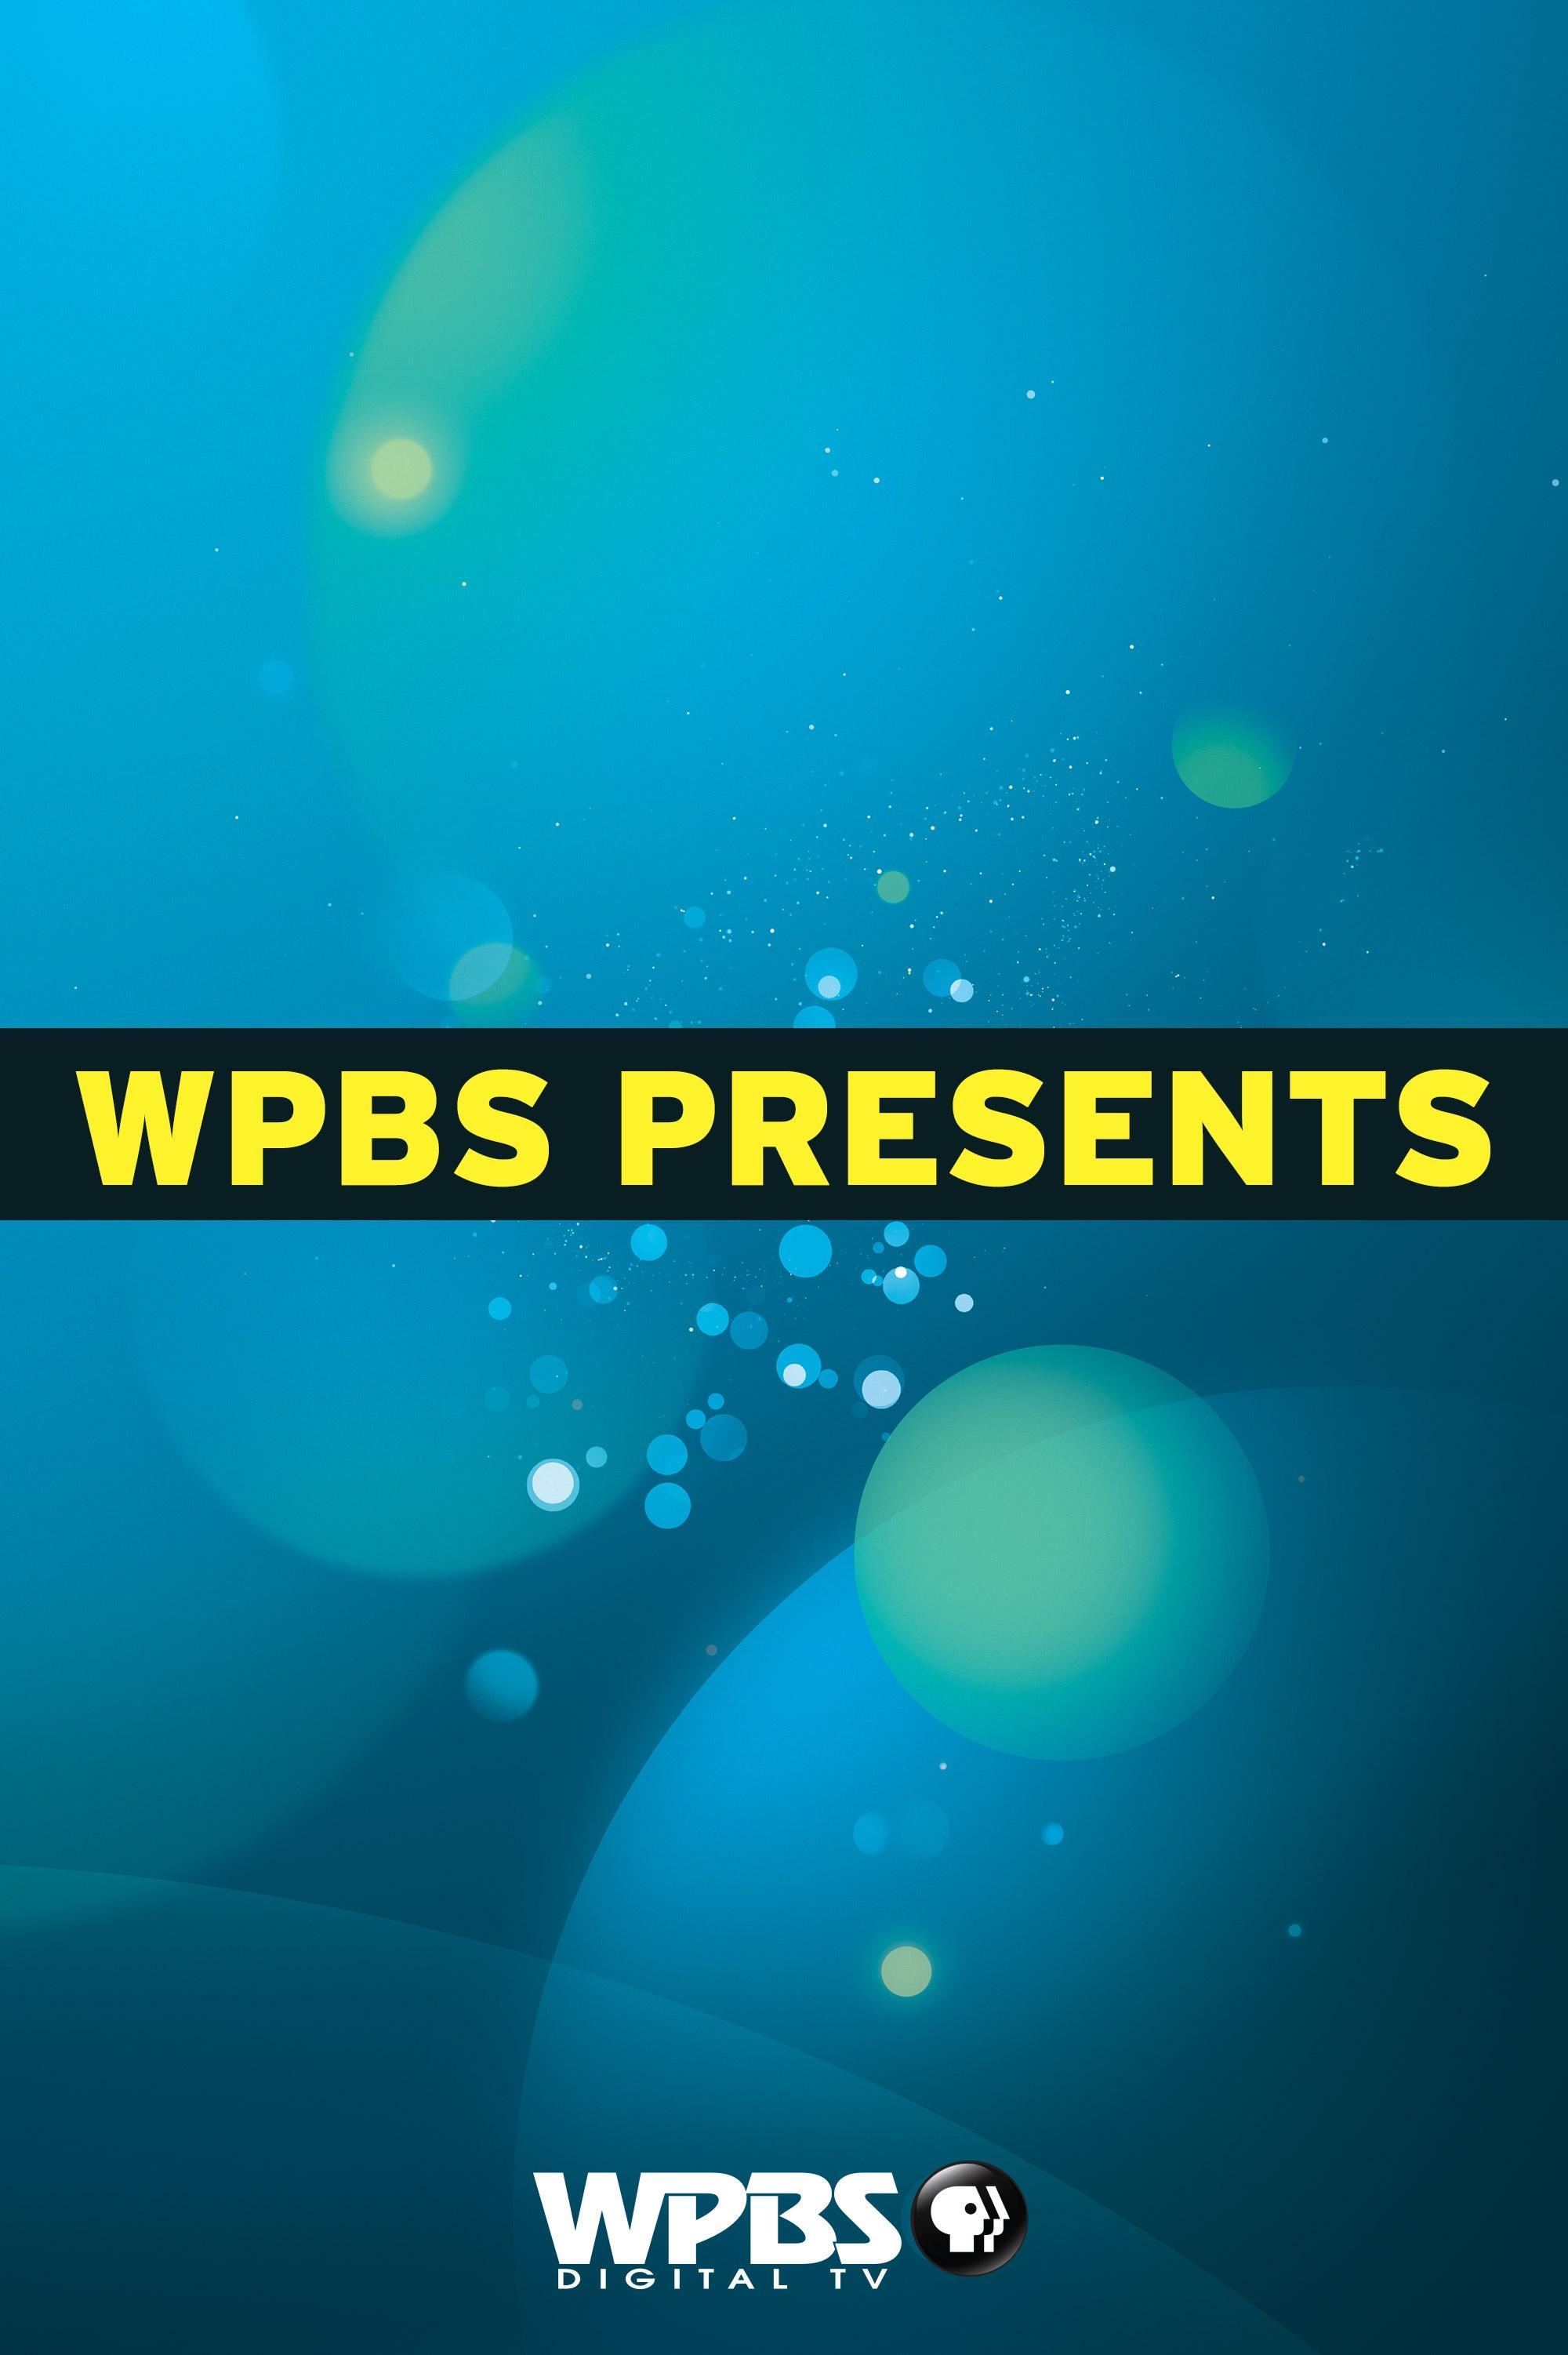 WPBS Presents | PBS